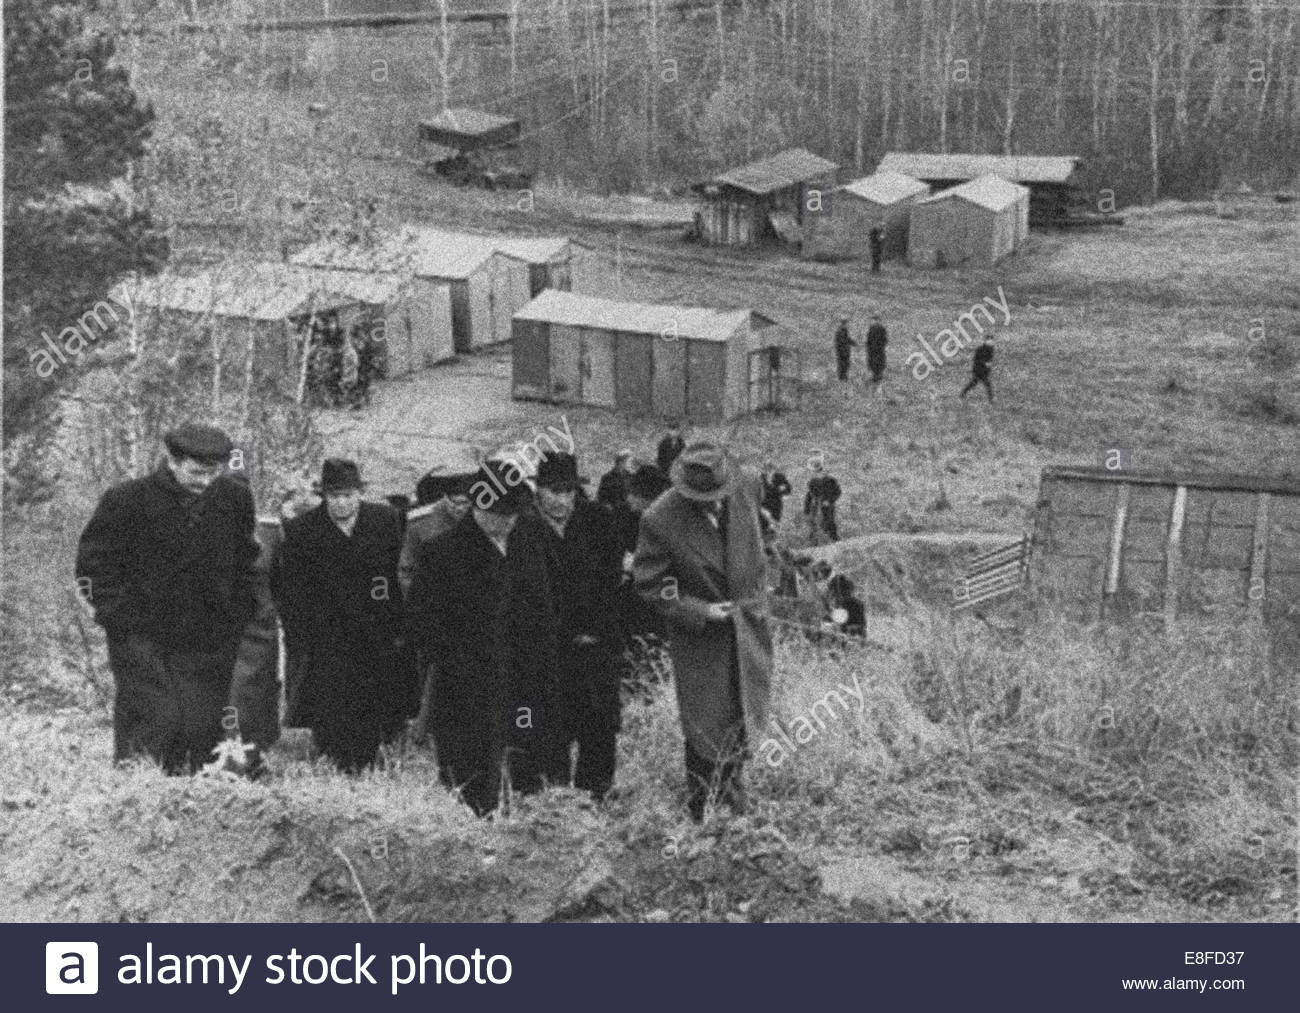 Nikita Khrushchev at the Construction of the Akademgorodok of Novosibirsk. Artist: Anonymous - Stock Image